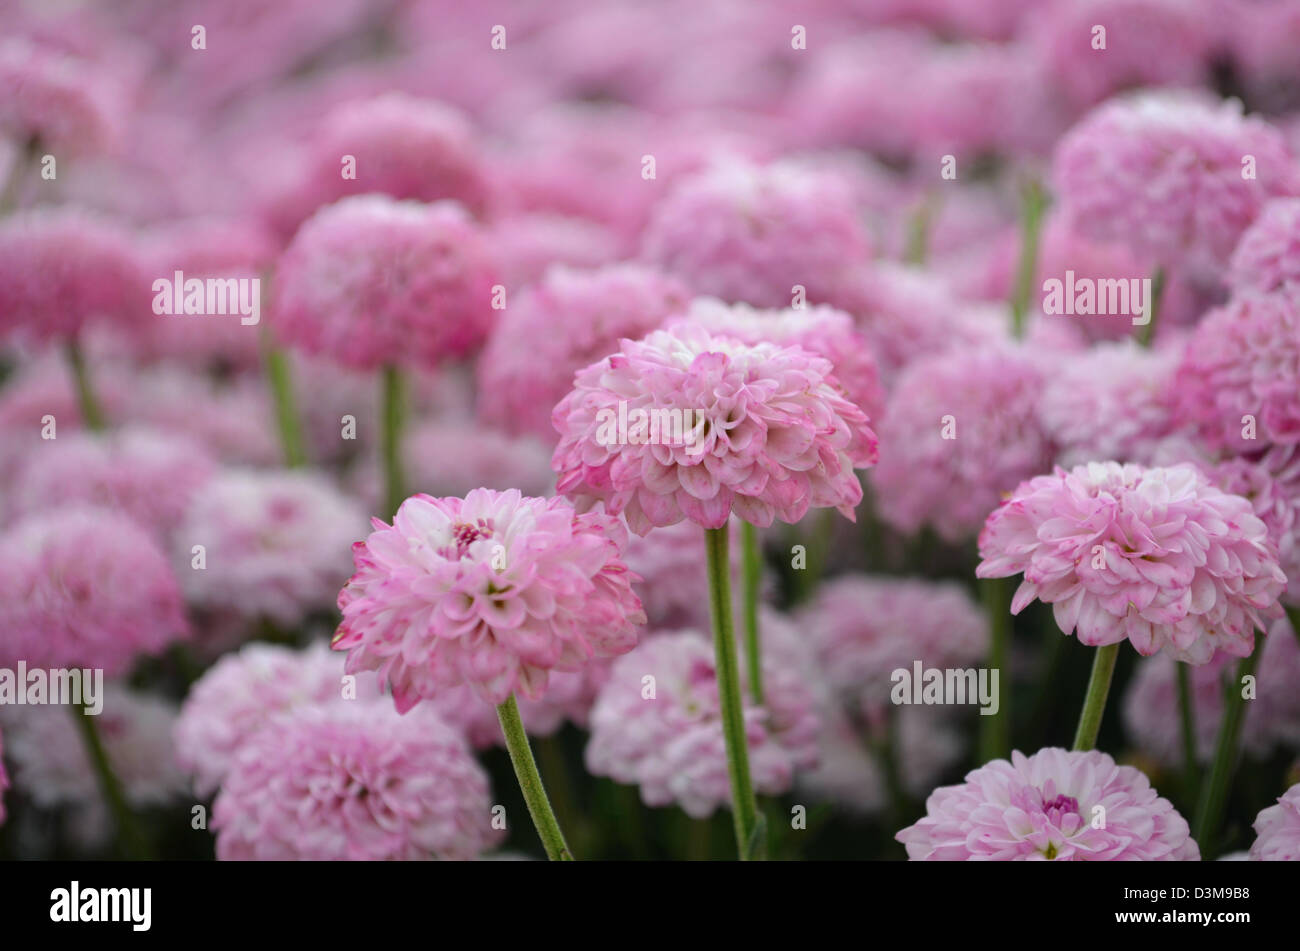 closeup selective focus of pink flowers  - Stock Image